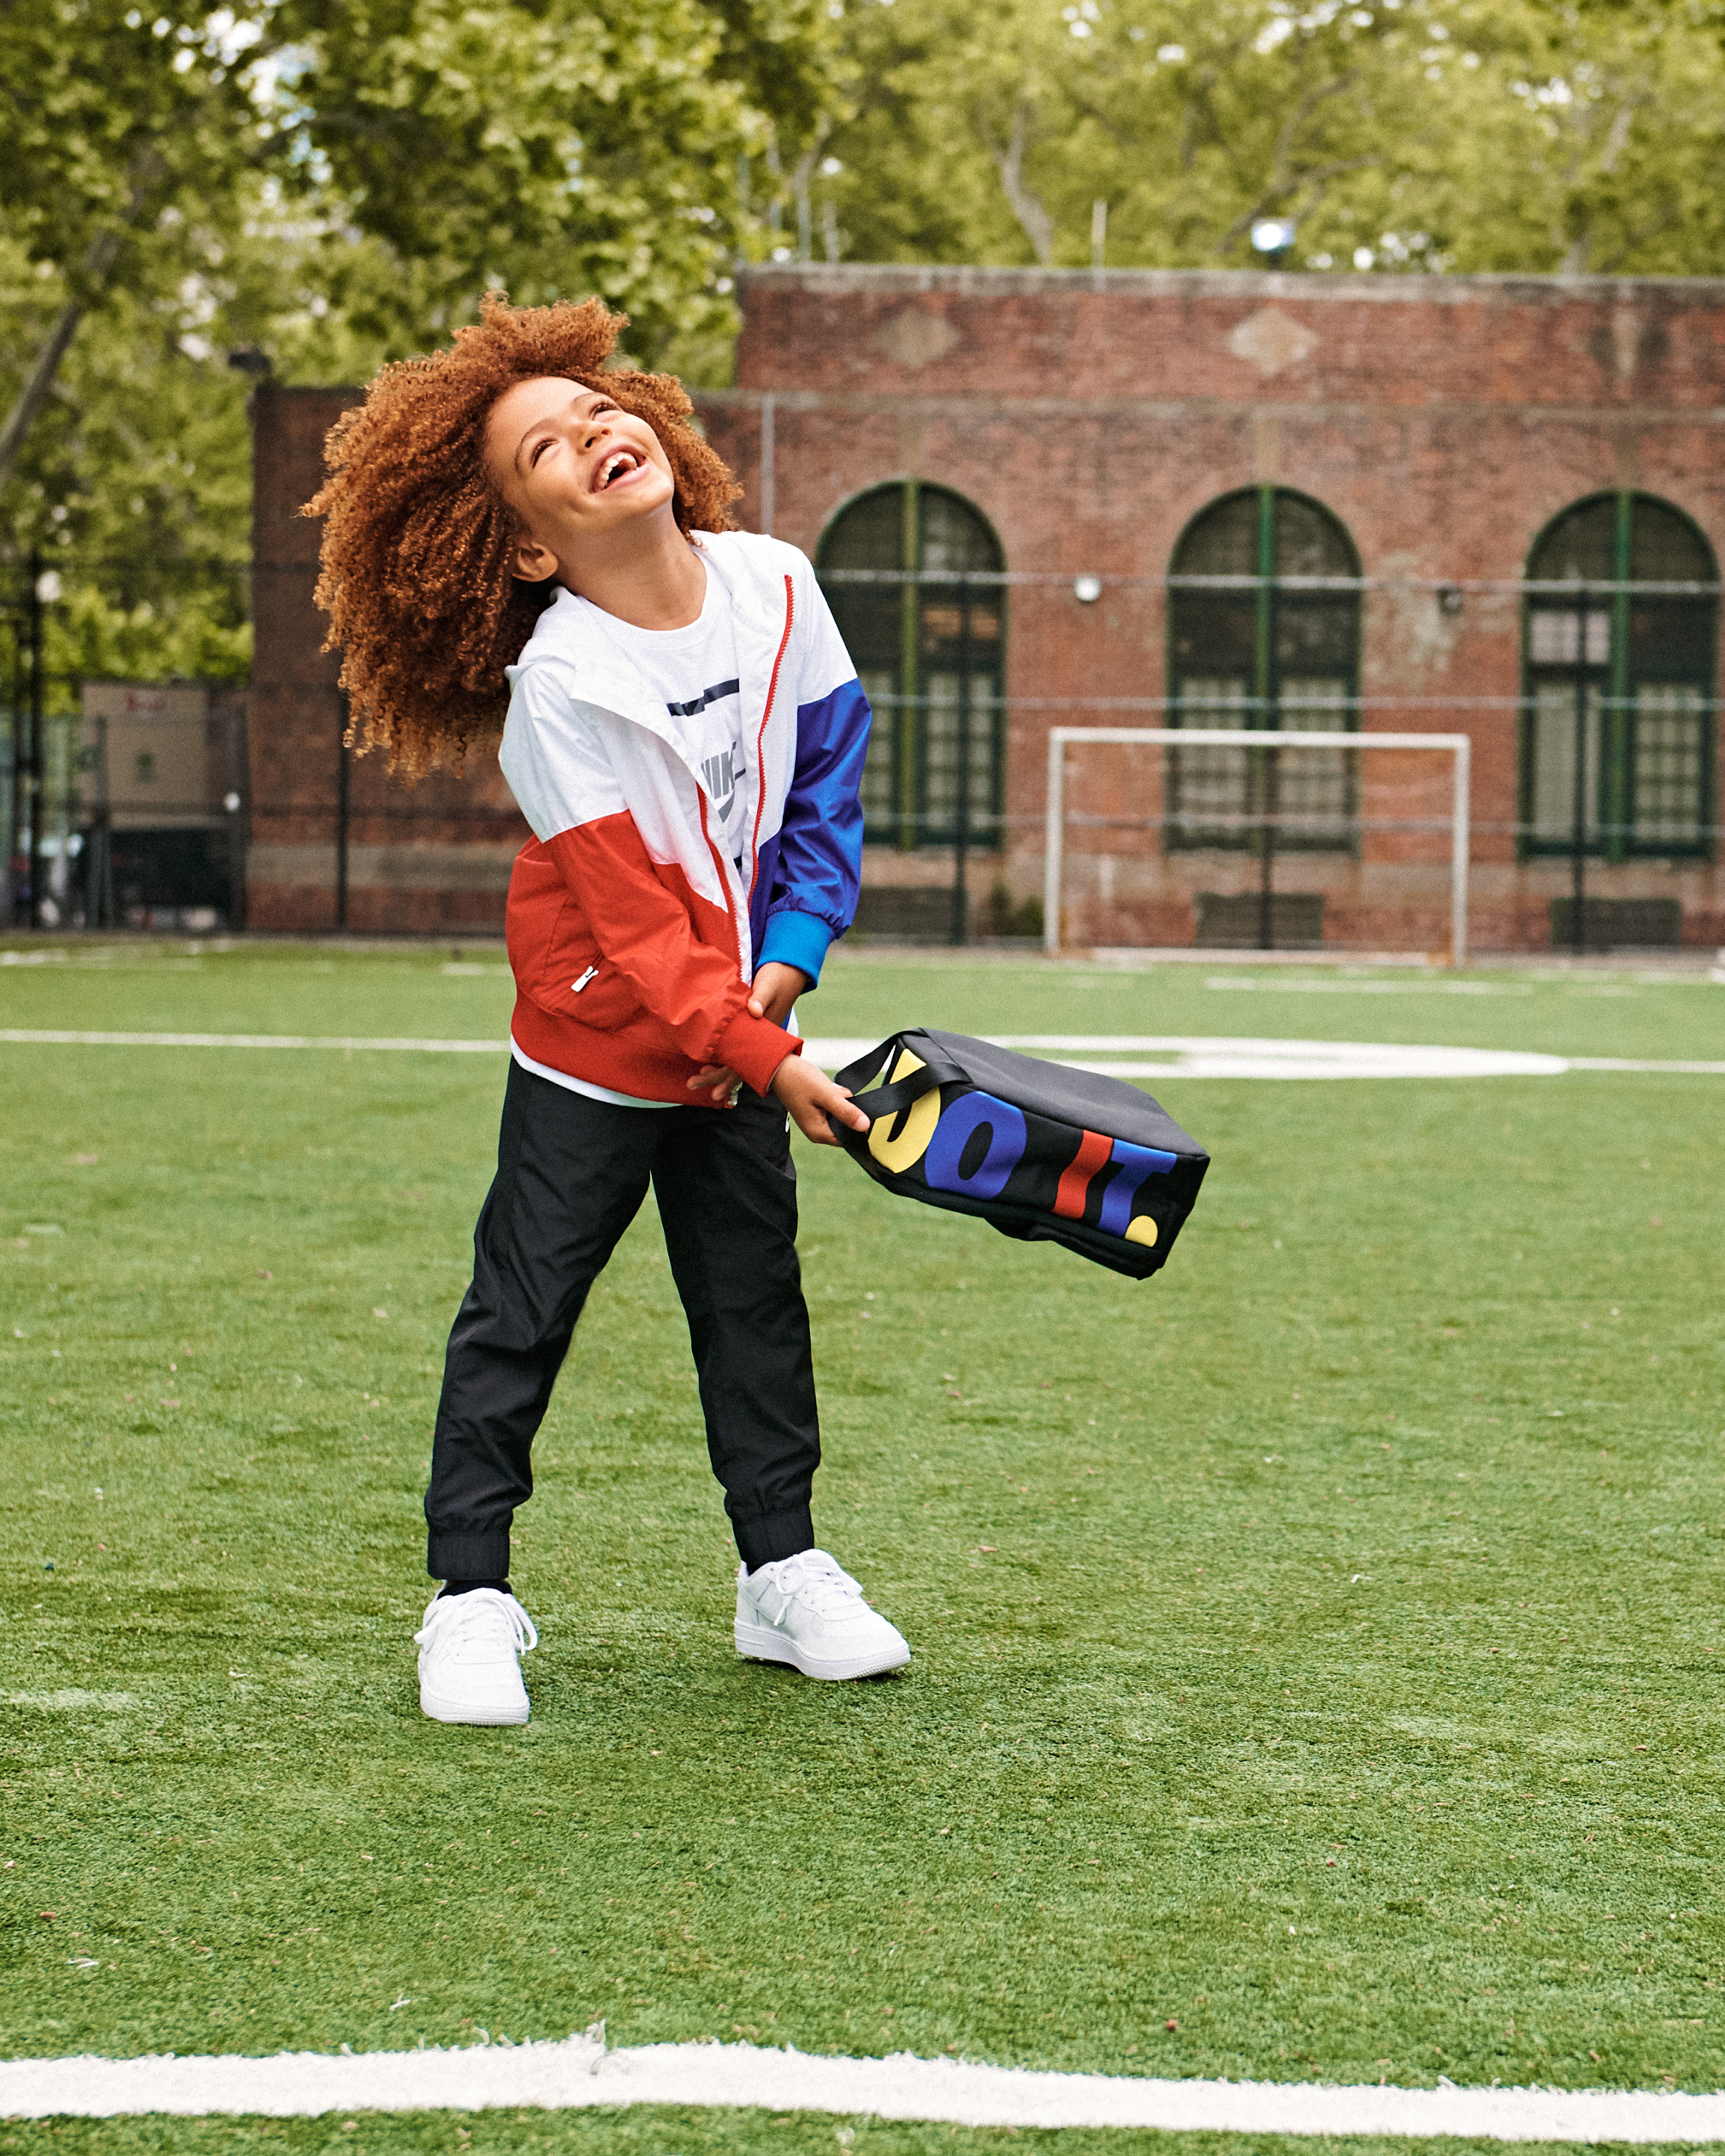 Nike Kids Fall 2018 Campaign